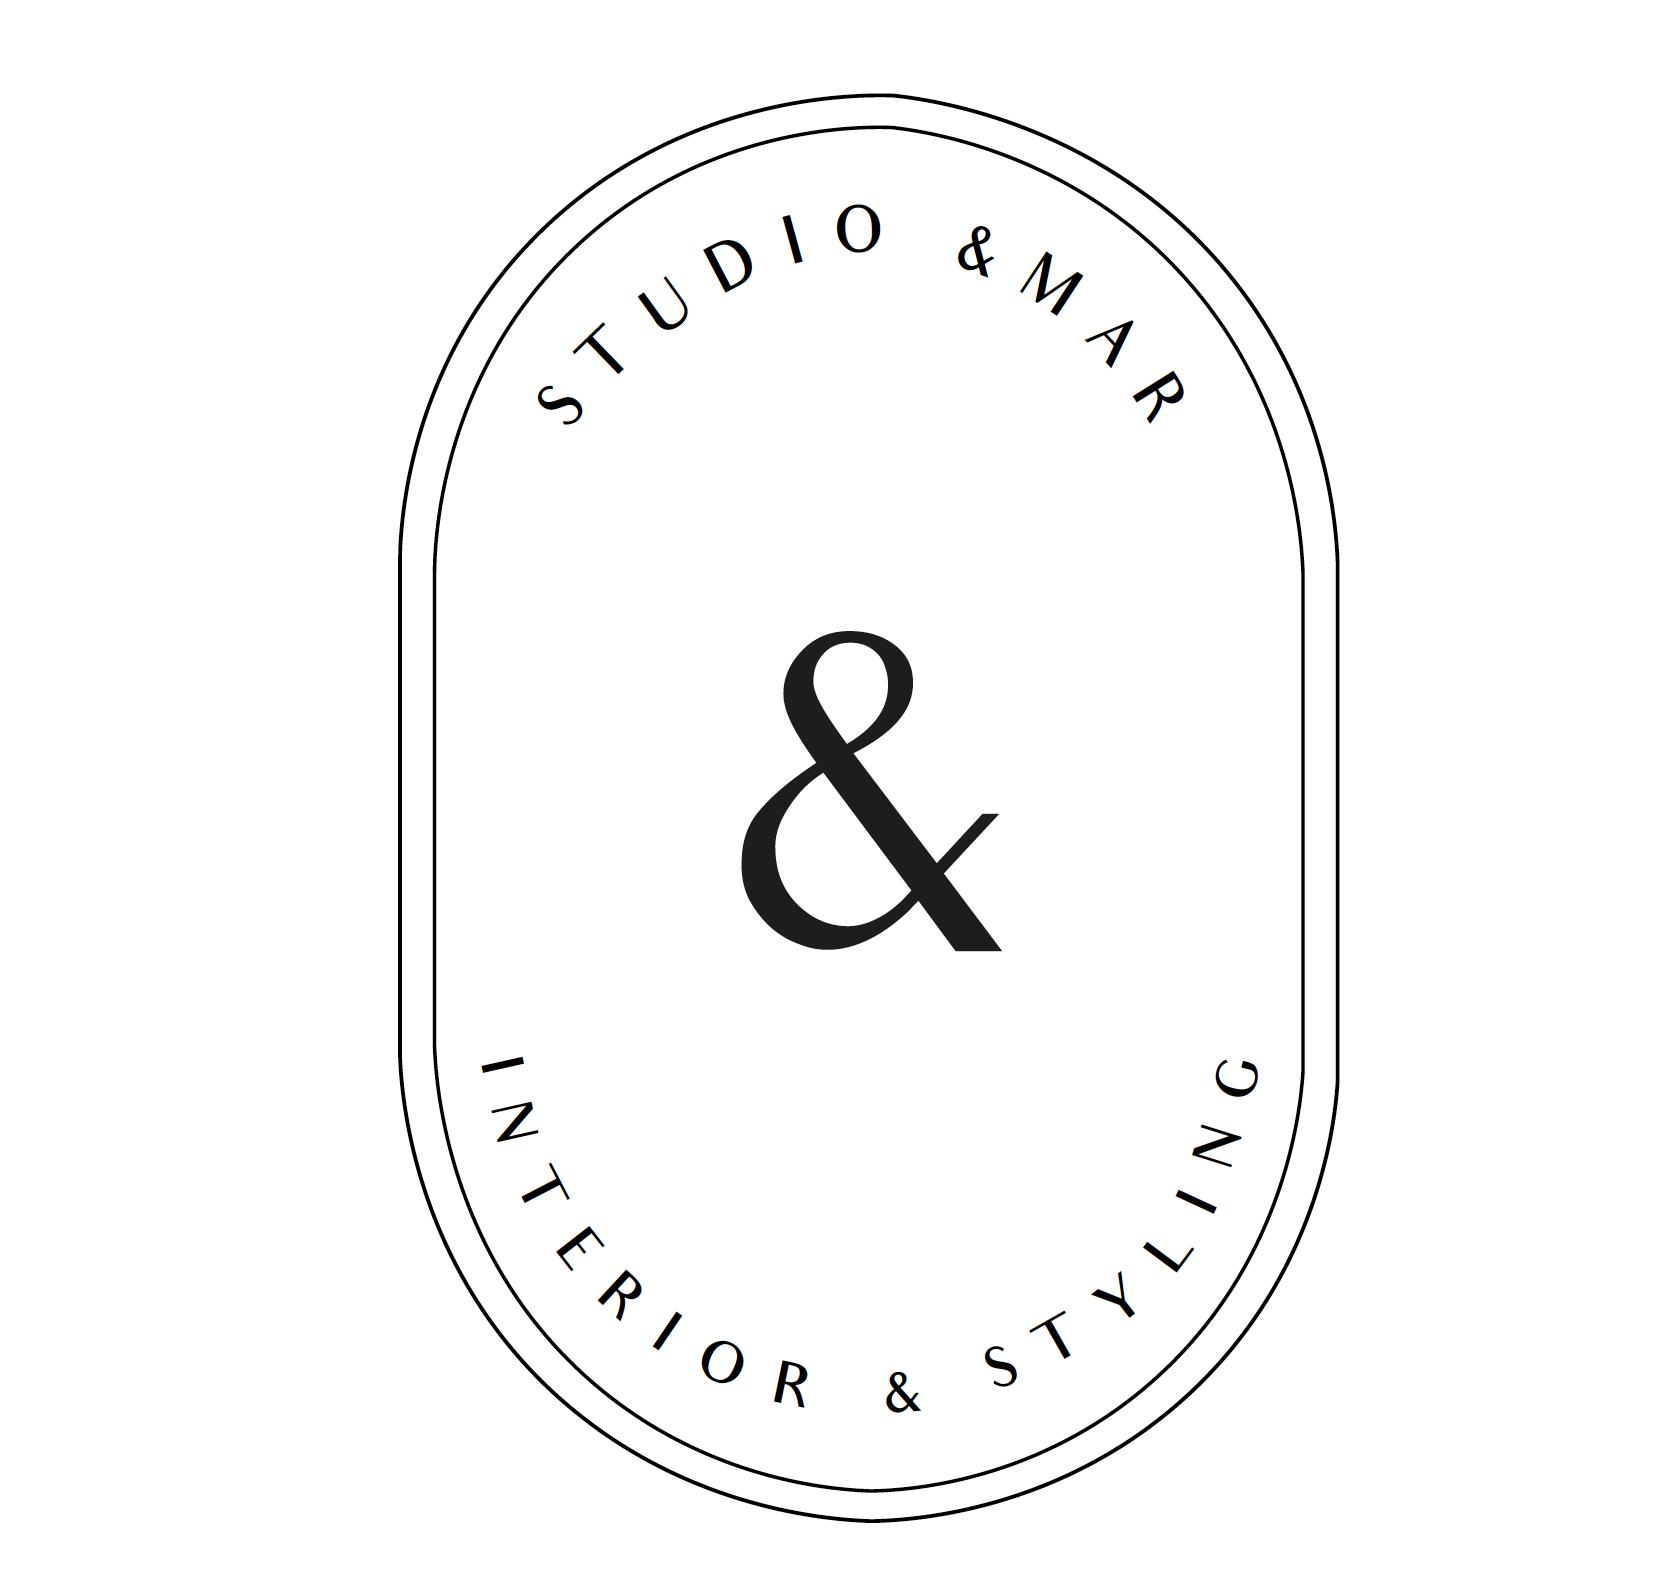 STUDIO &MAR